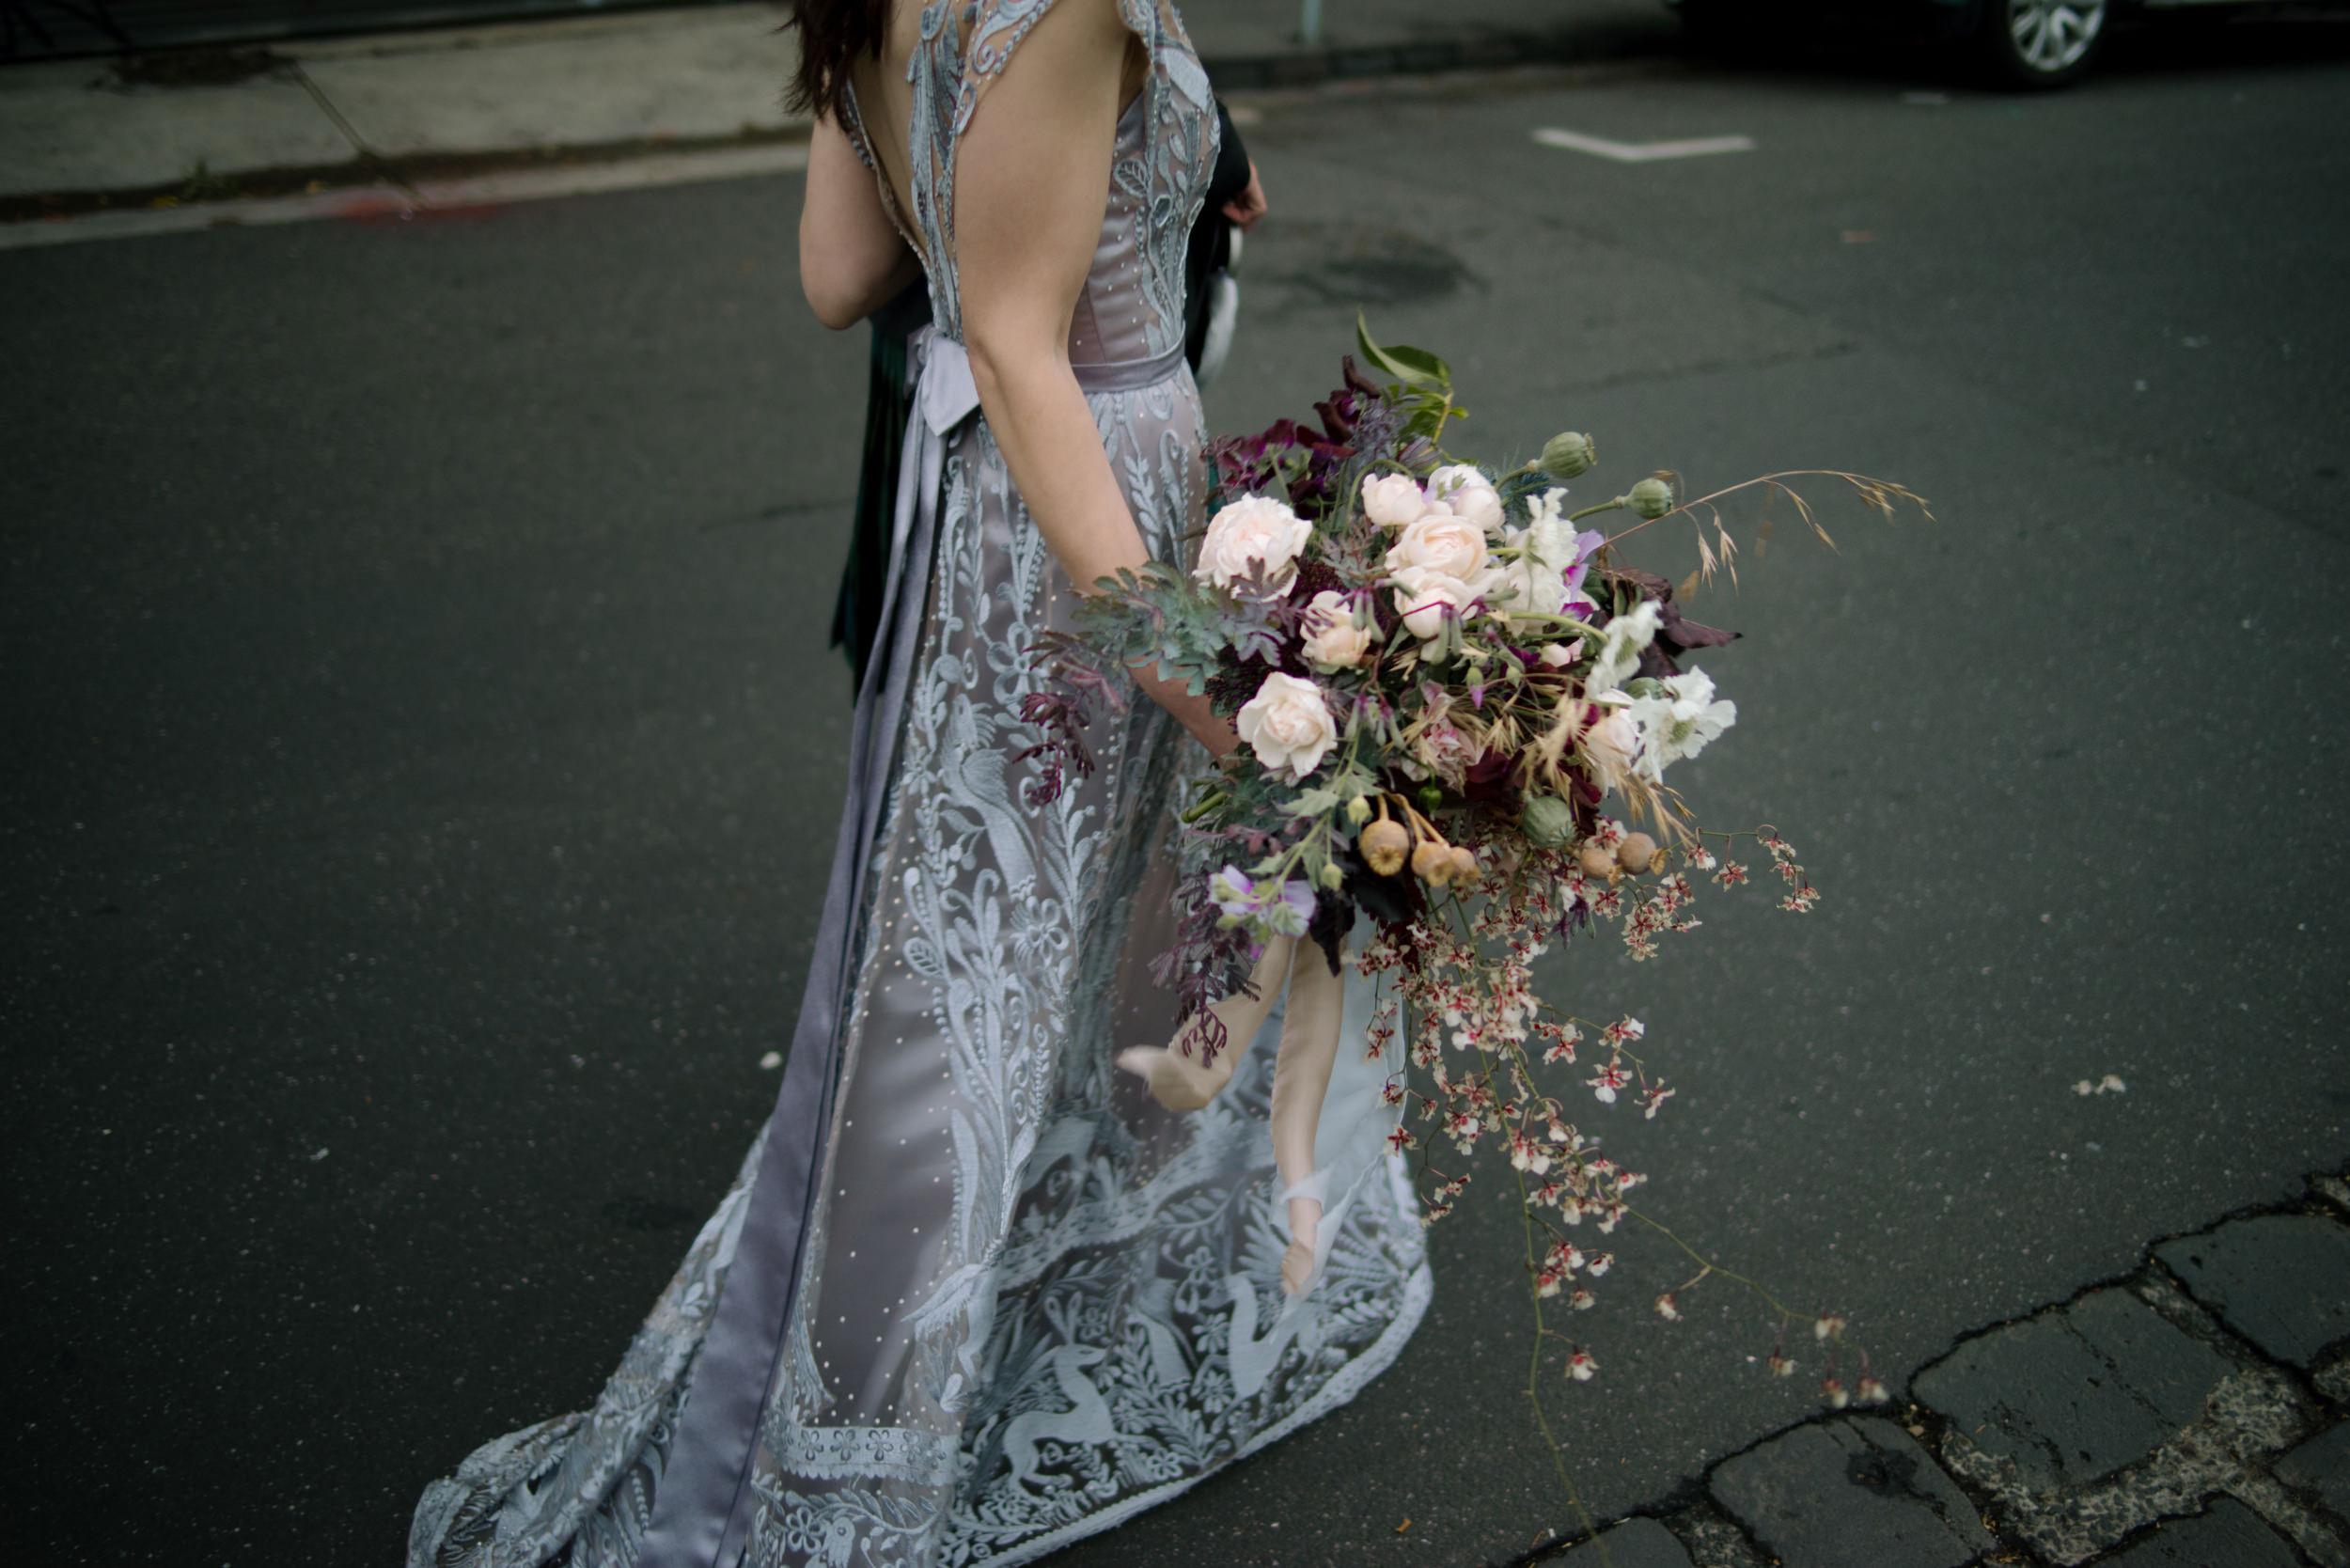 I-Got-You-Babe-&.Co.-Glasshaus-Wedding-Charlotte-Cameron0111.JPG